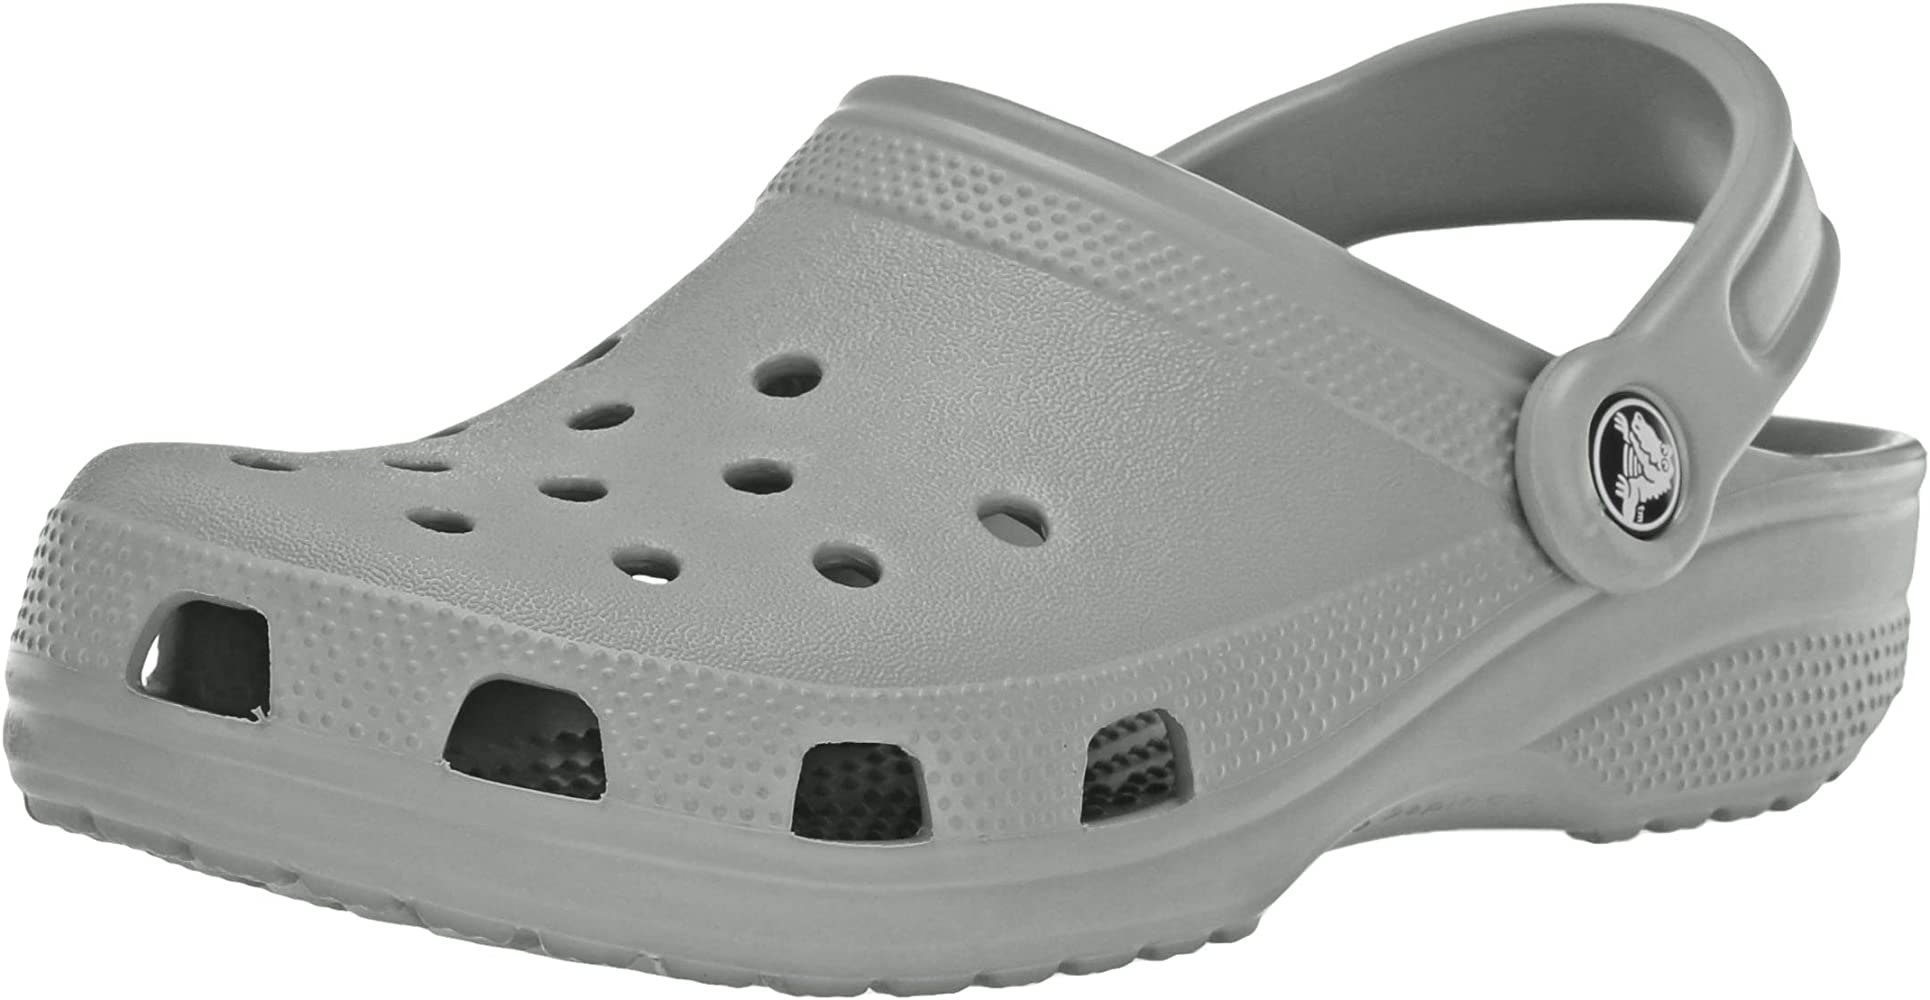 Crocs Unisex's Classic Clog